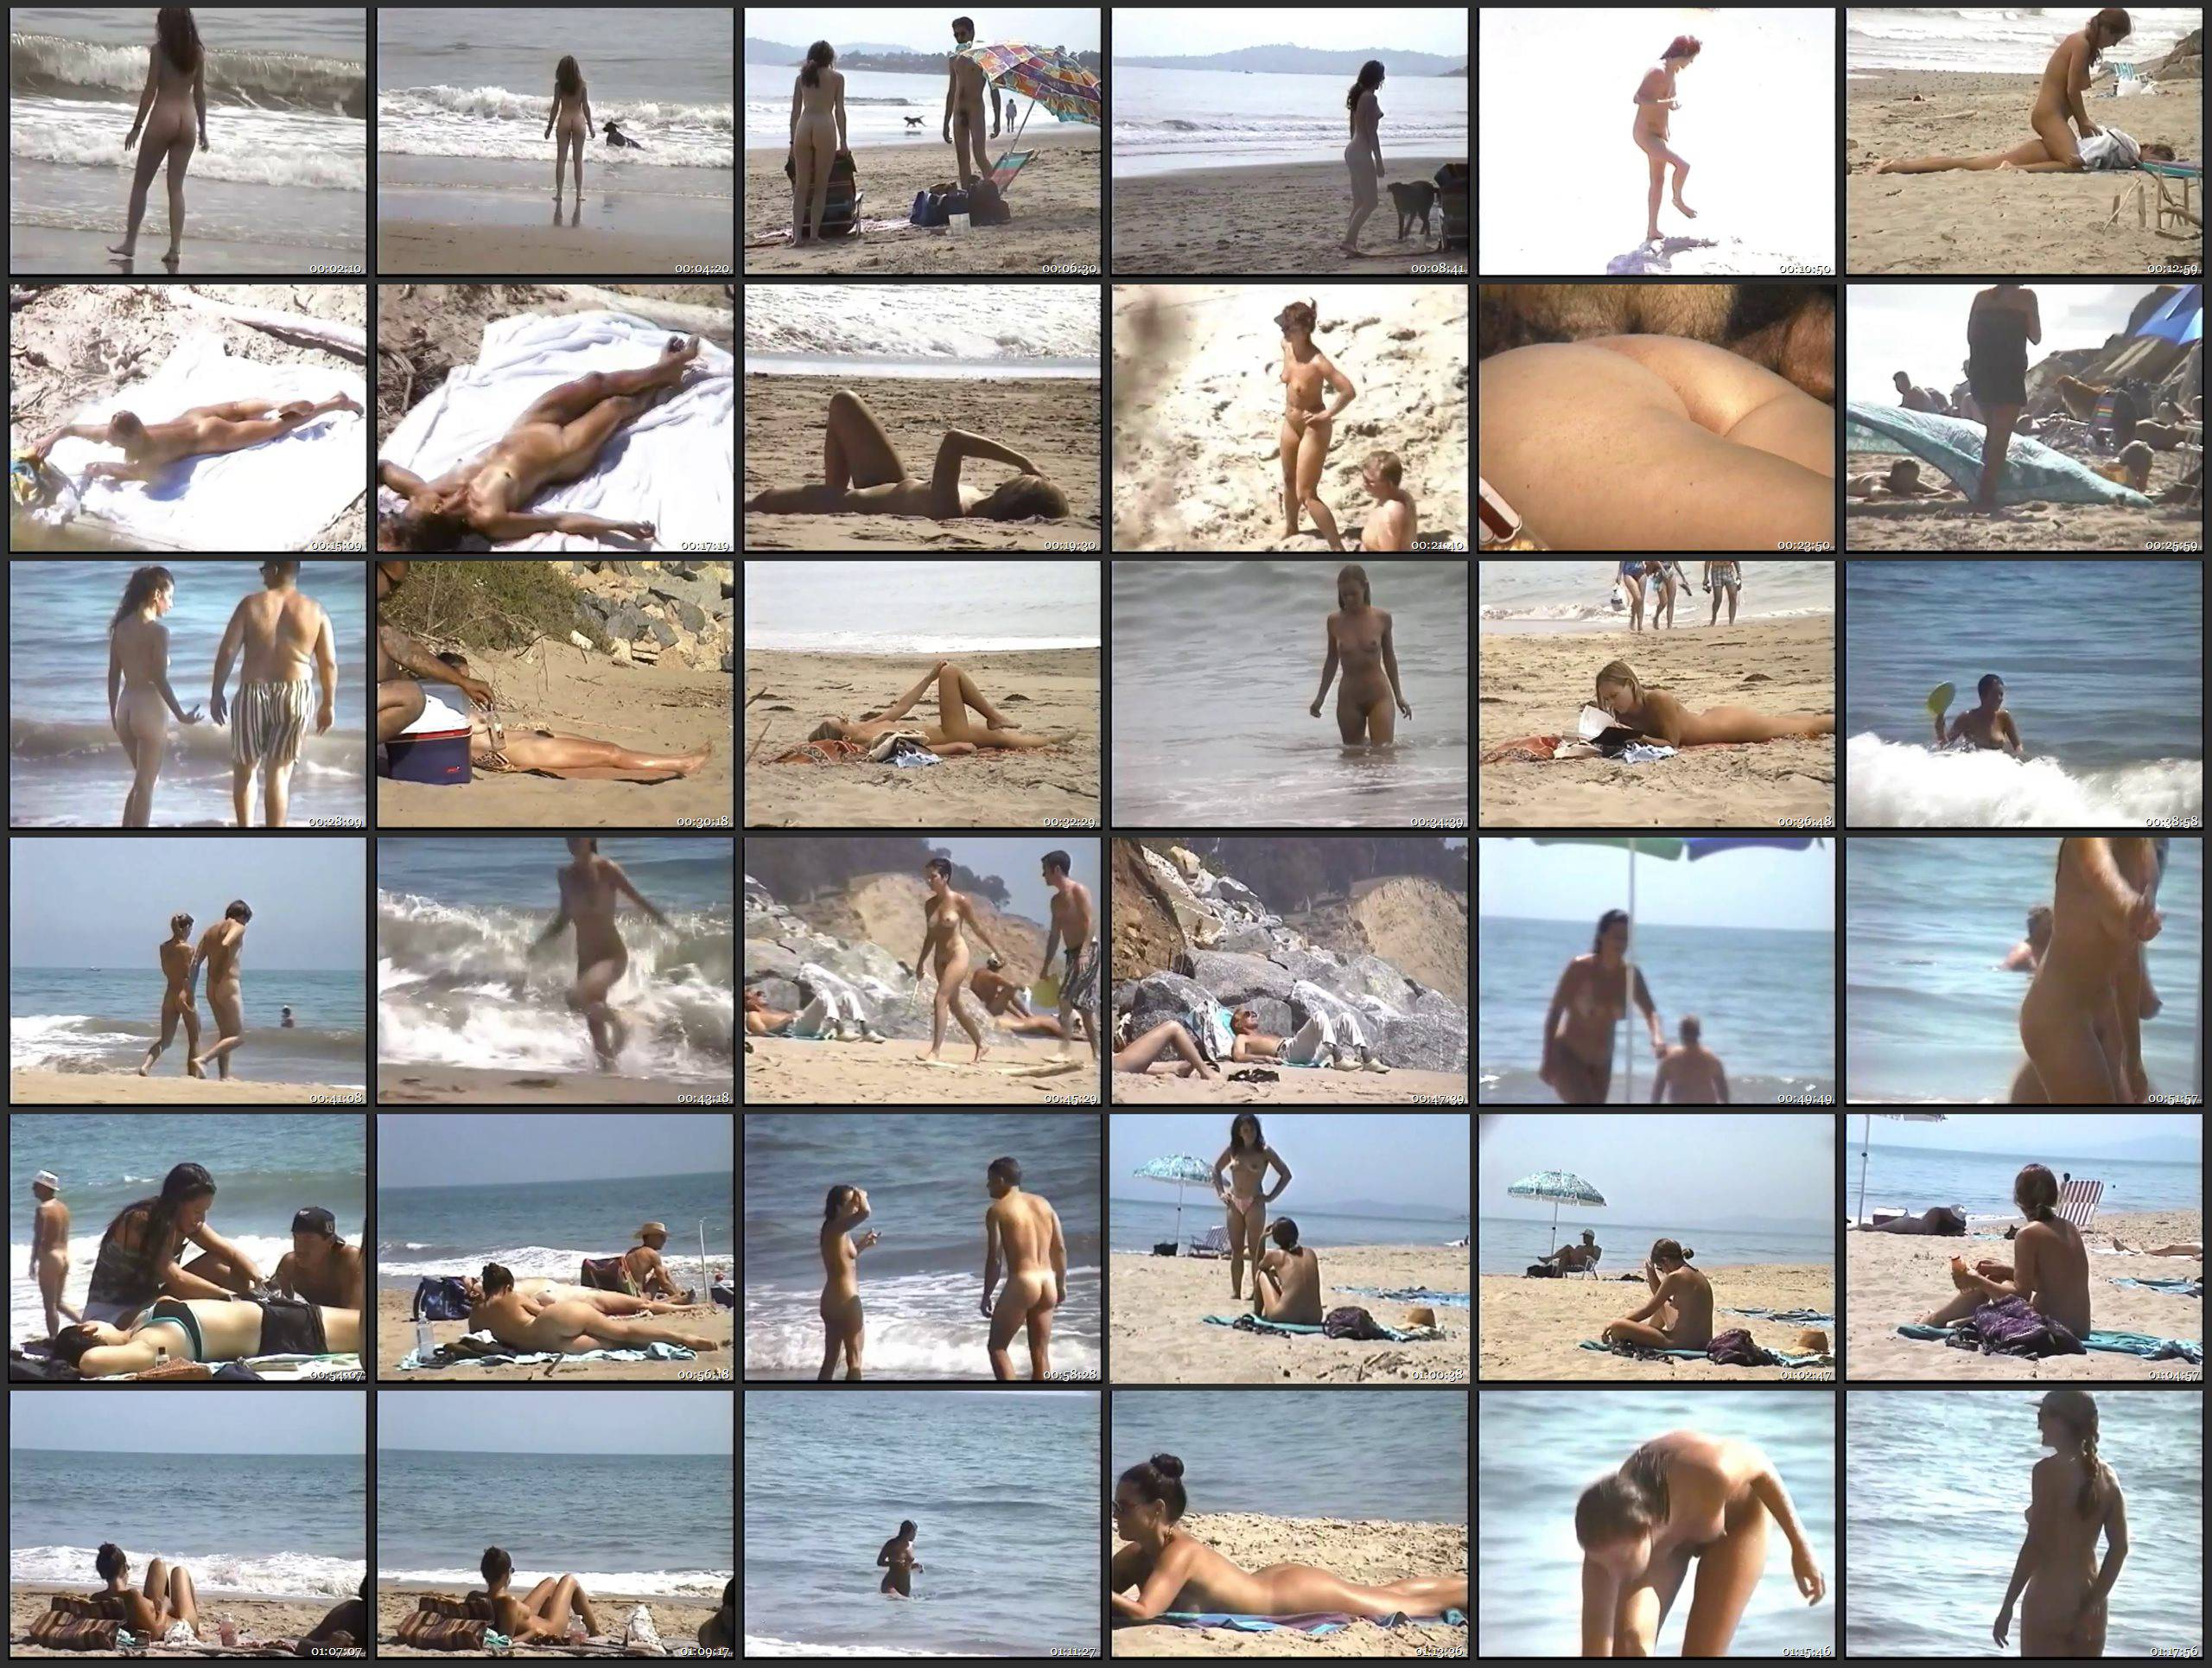 Brads California Dreamers 2 - Thumbnails